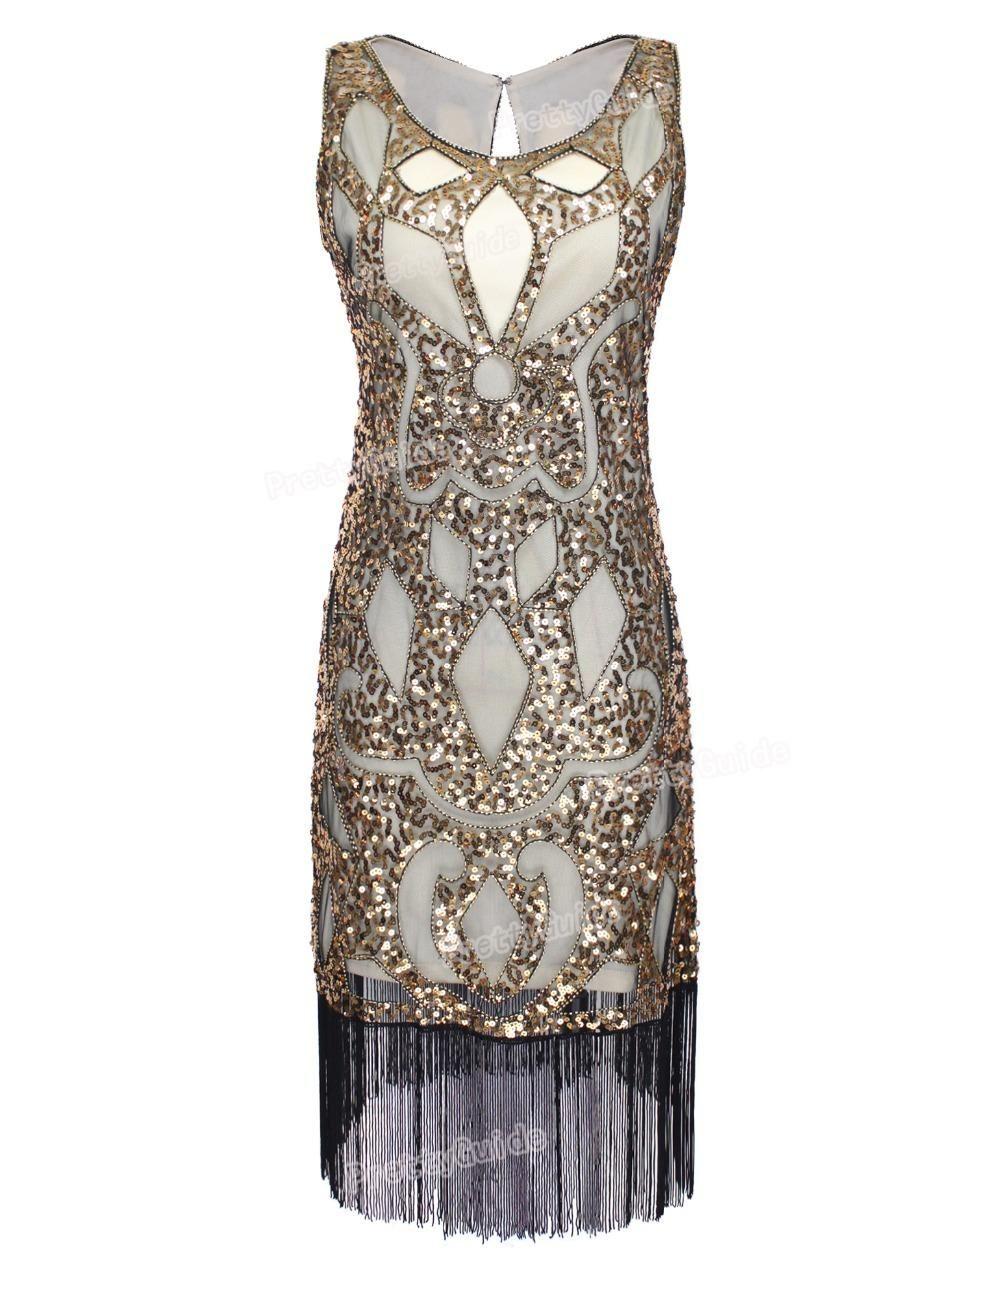 a16a20a09 Compre PrettyGuide Mujeres 1920 s Lentejuelas Art Deco Hollow Paisley Tribu Cóctel  Inspirado Flapper Dress Gran Vestido Gatsby A  156.52 Del Kaway